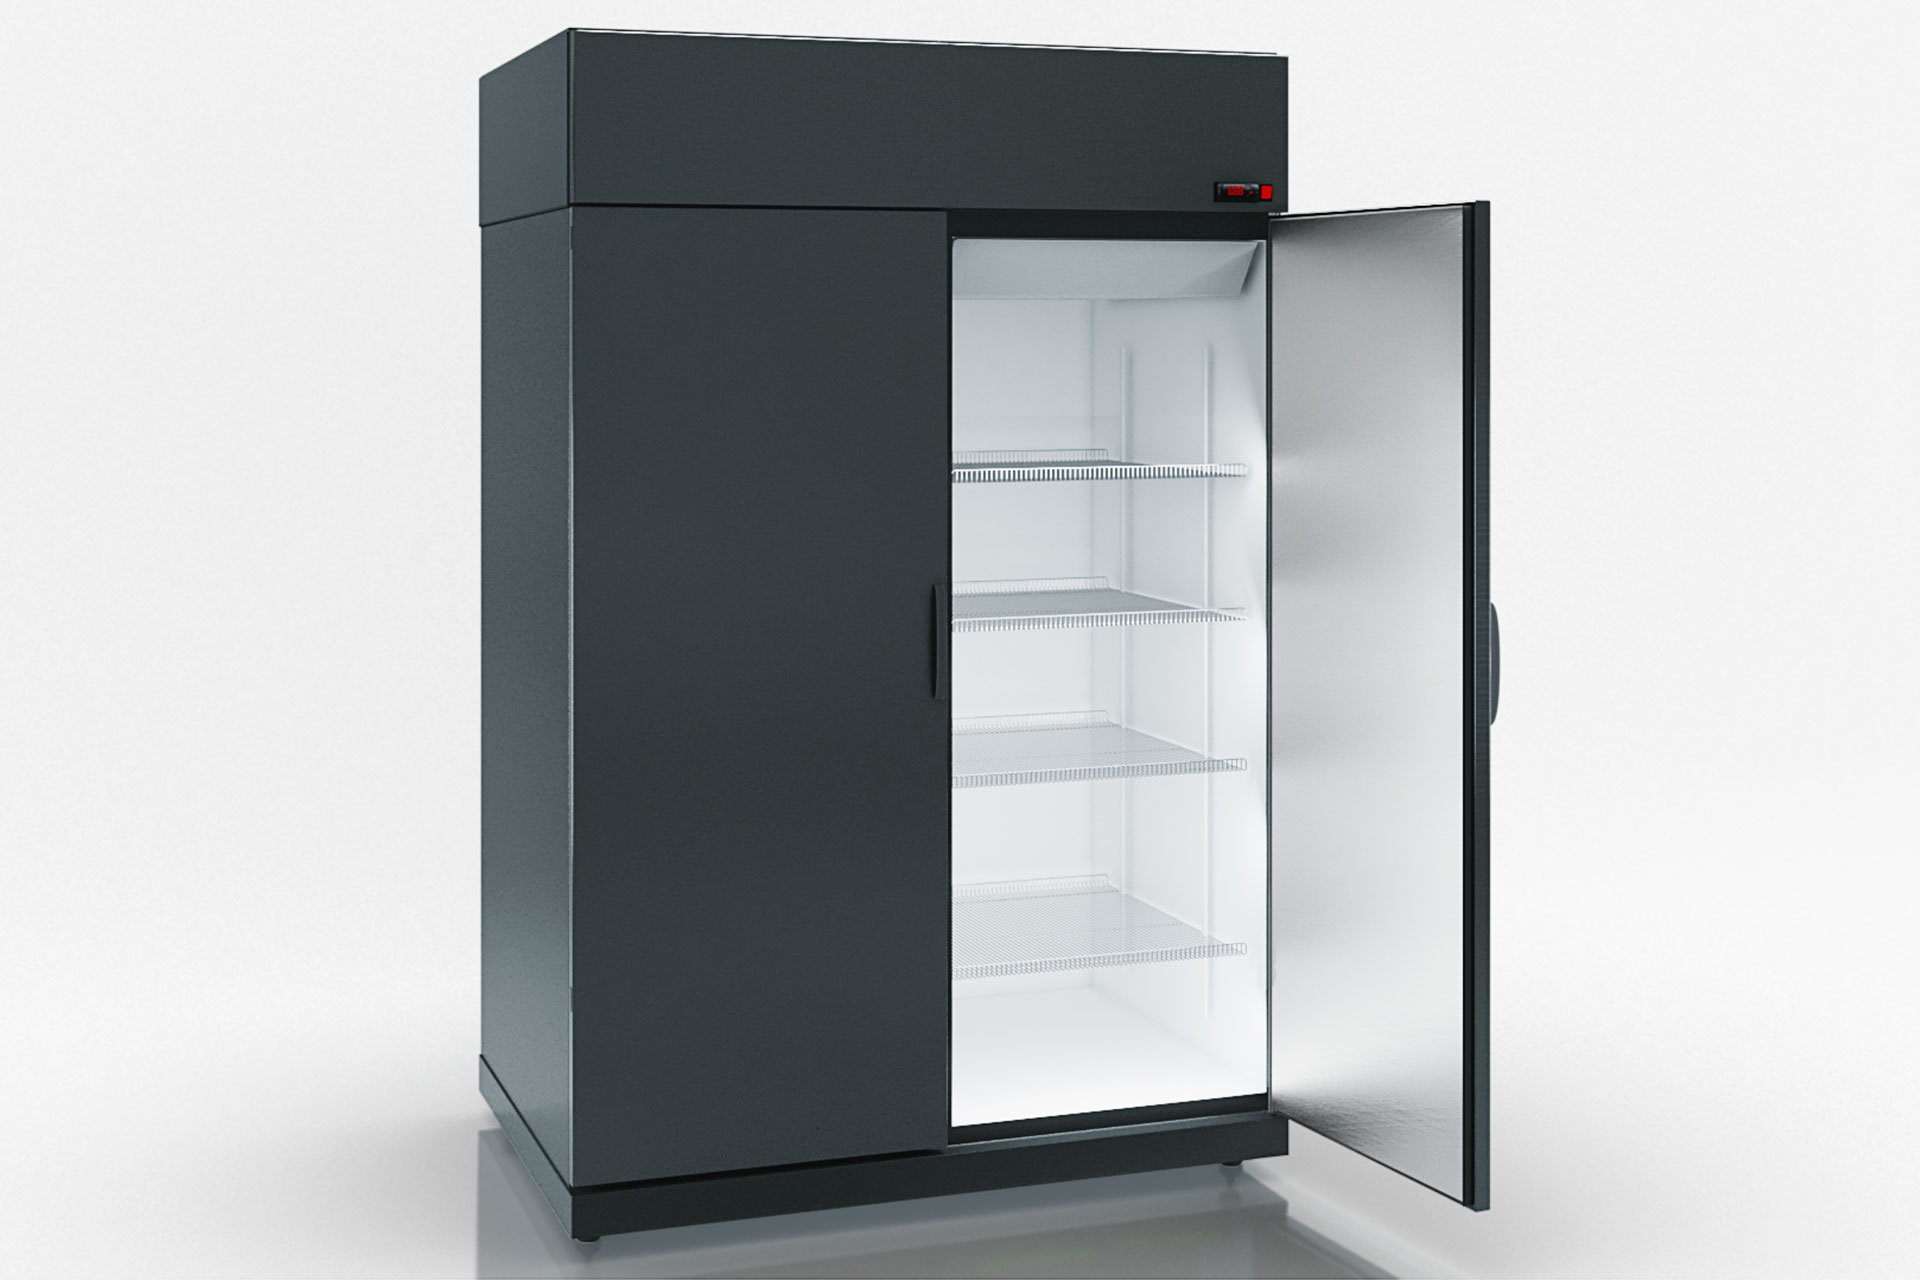 Холодильные шкафы Kansas VАZG 075 LT 2HD 210-D1200A-132